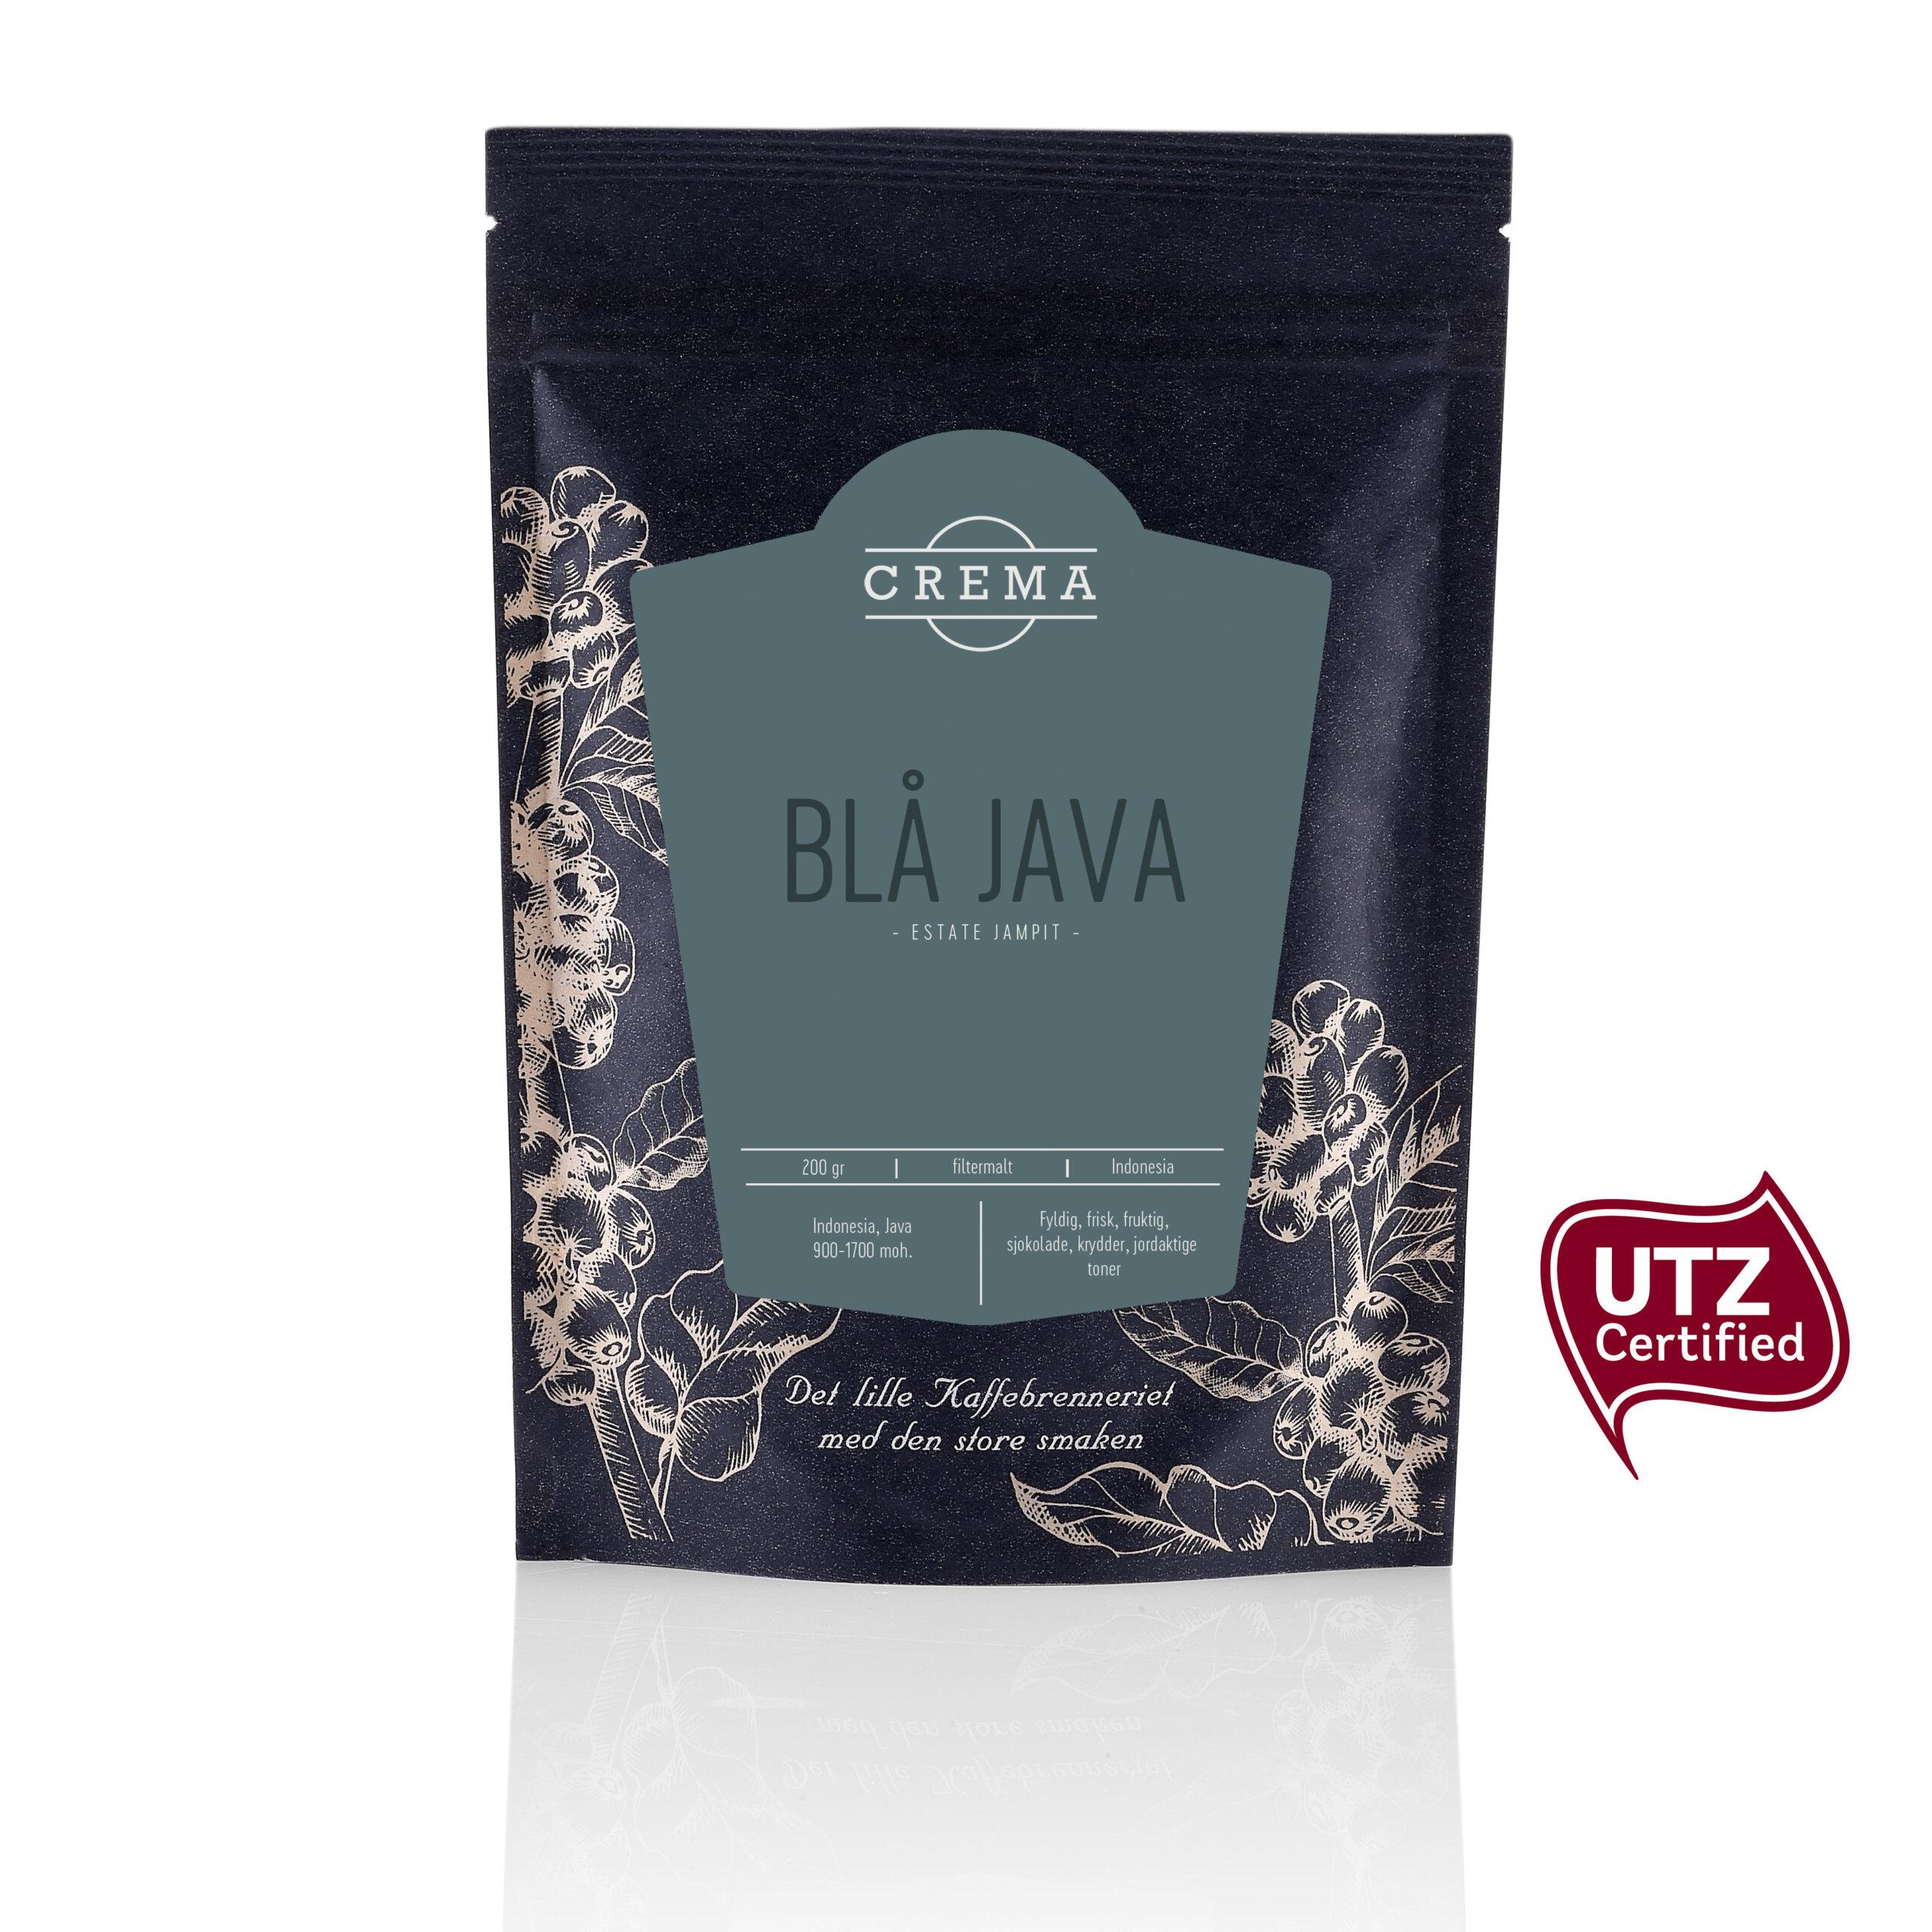 Crema Blå Java kaffe filtermalt